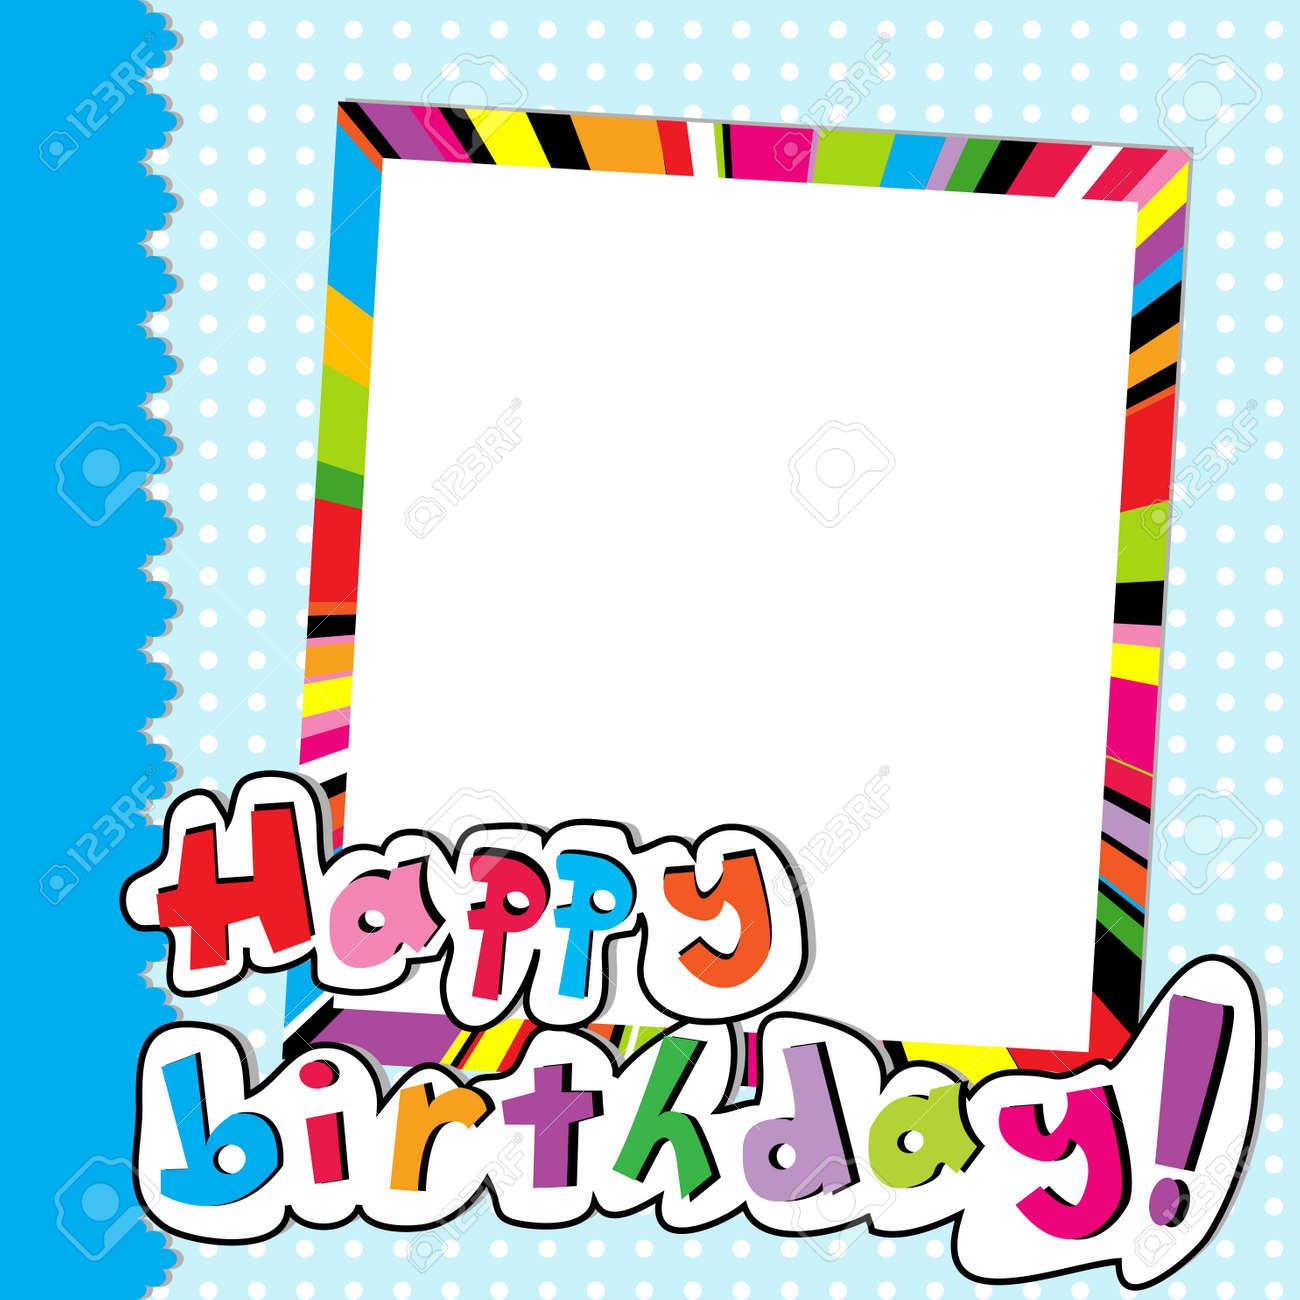 Birthday Frame For Boy - Frame Design & Reviews ✓